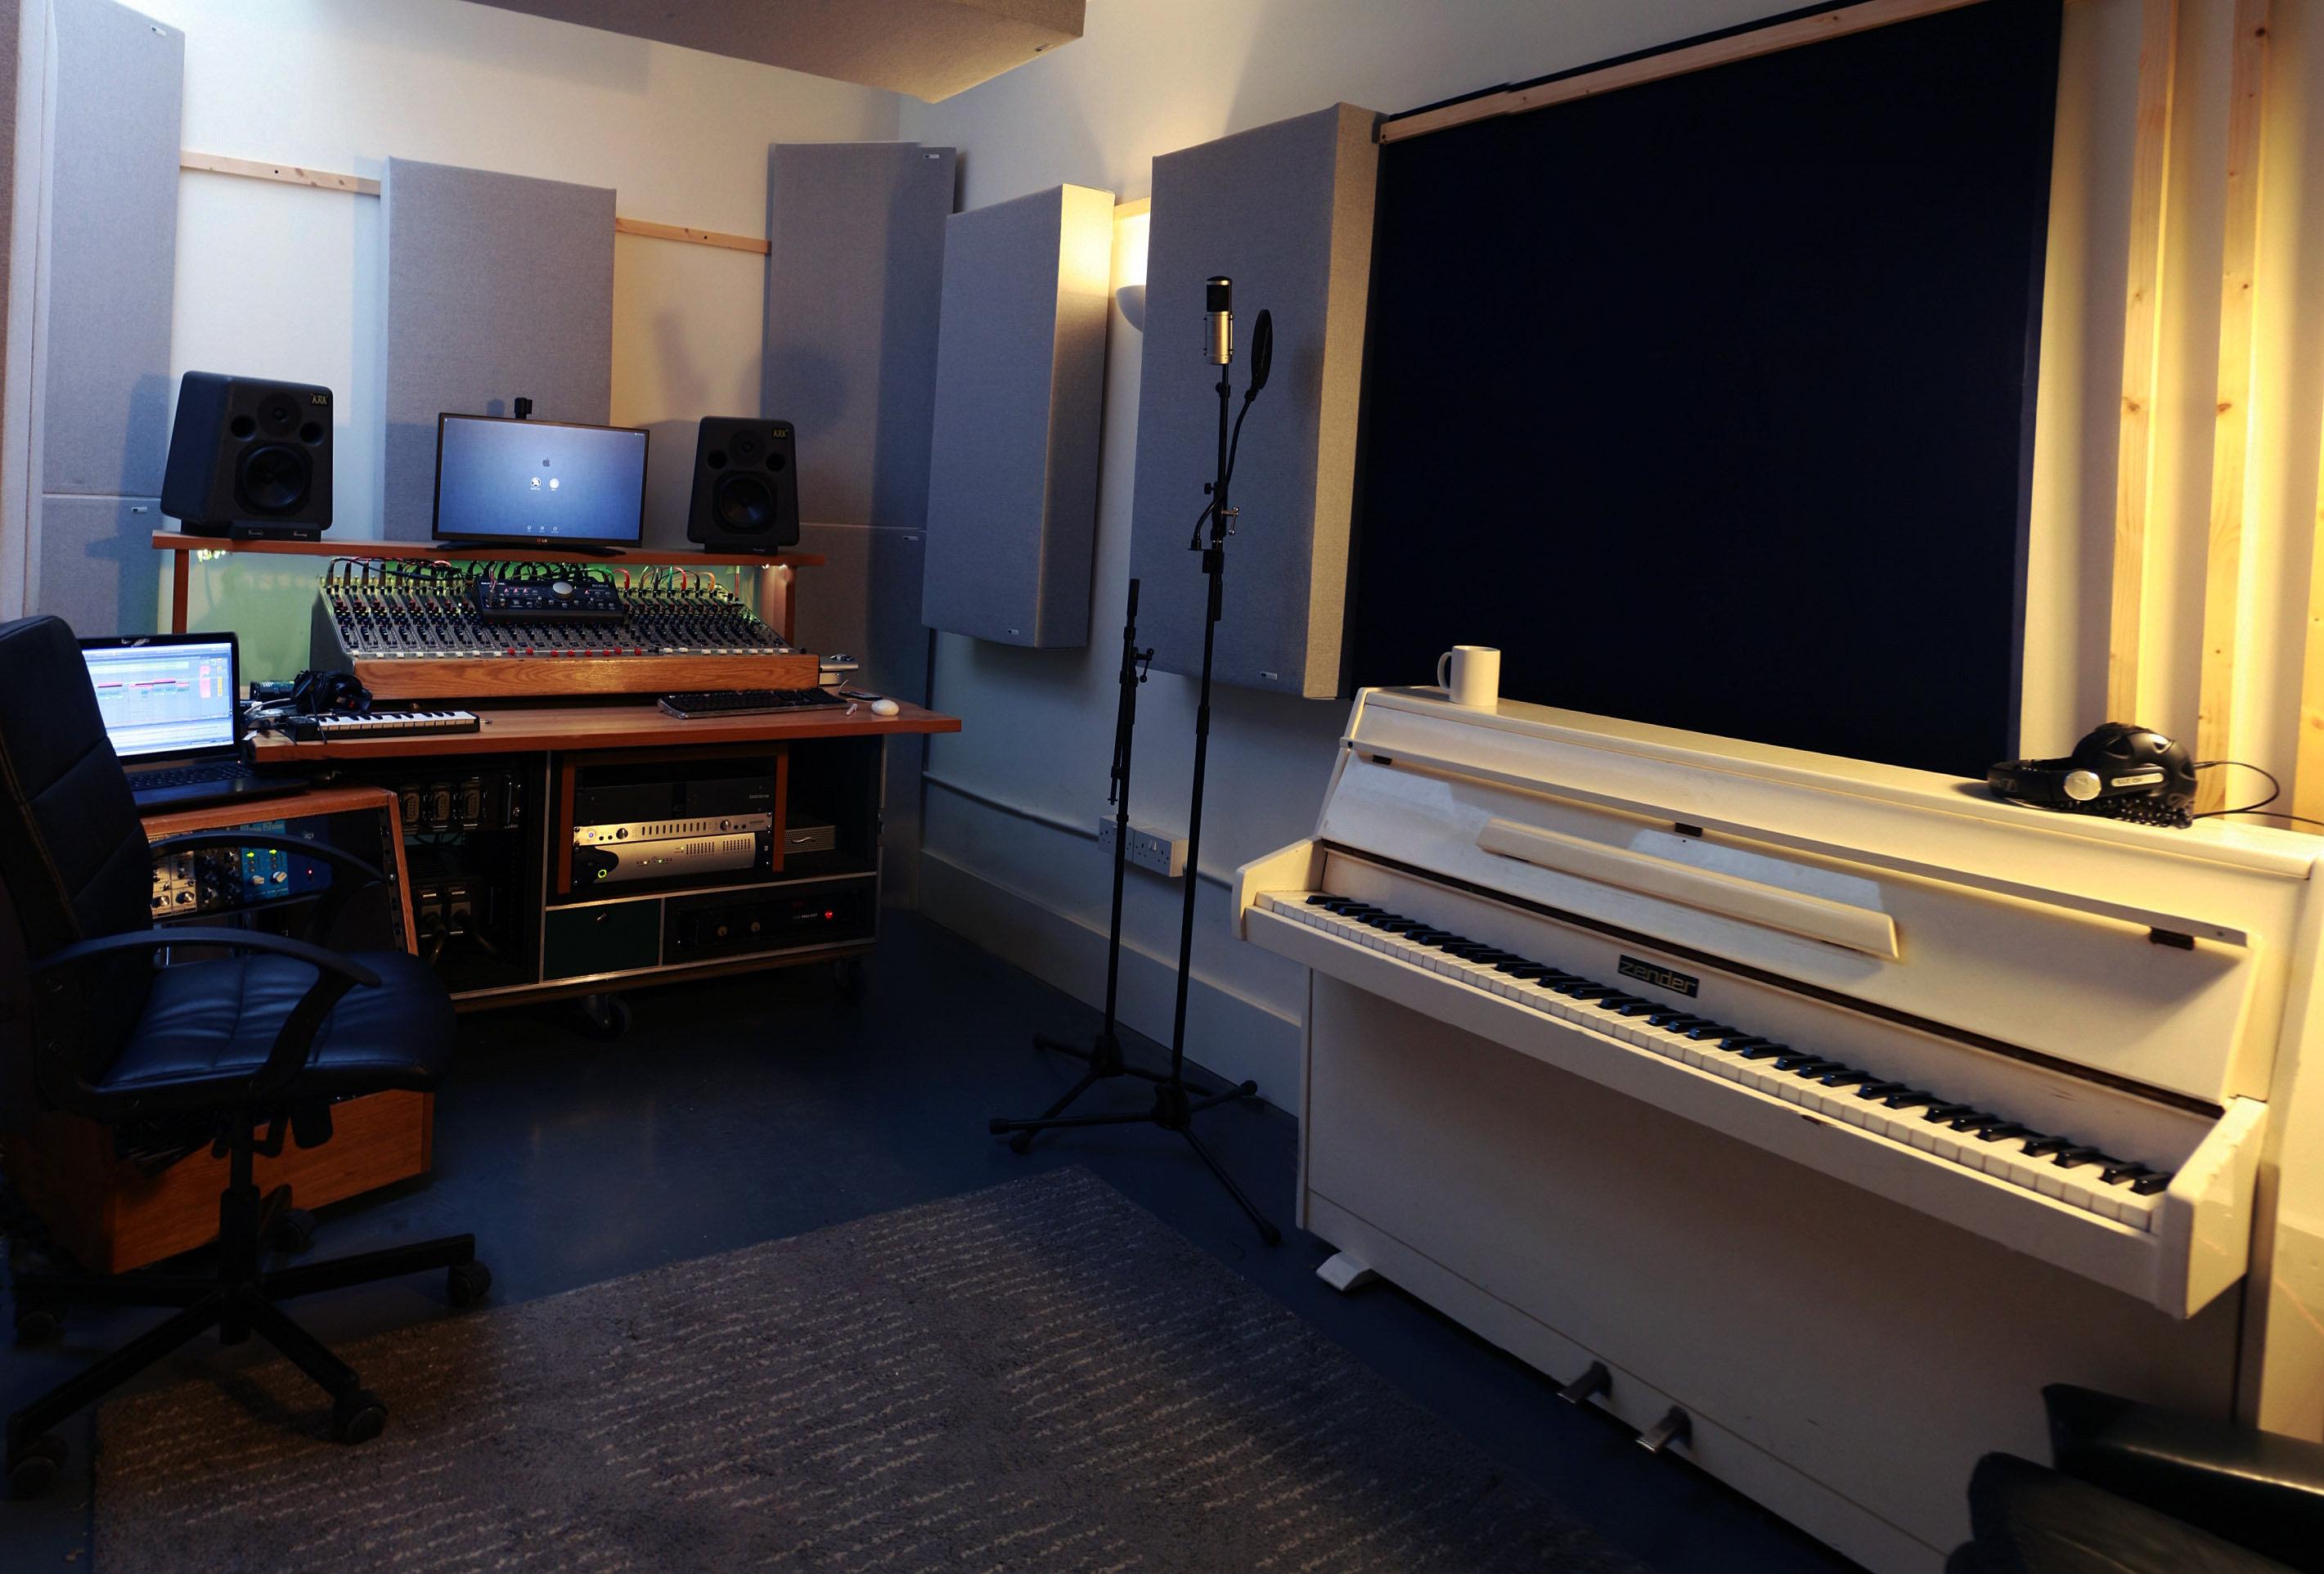 Swell La Boutique Studio Recording Studio London The White Room Largest Home Design Picture Inspirations Pitcheantrous